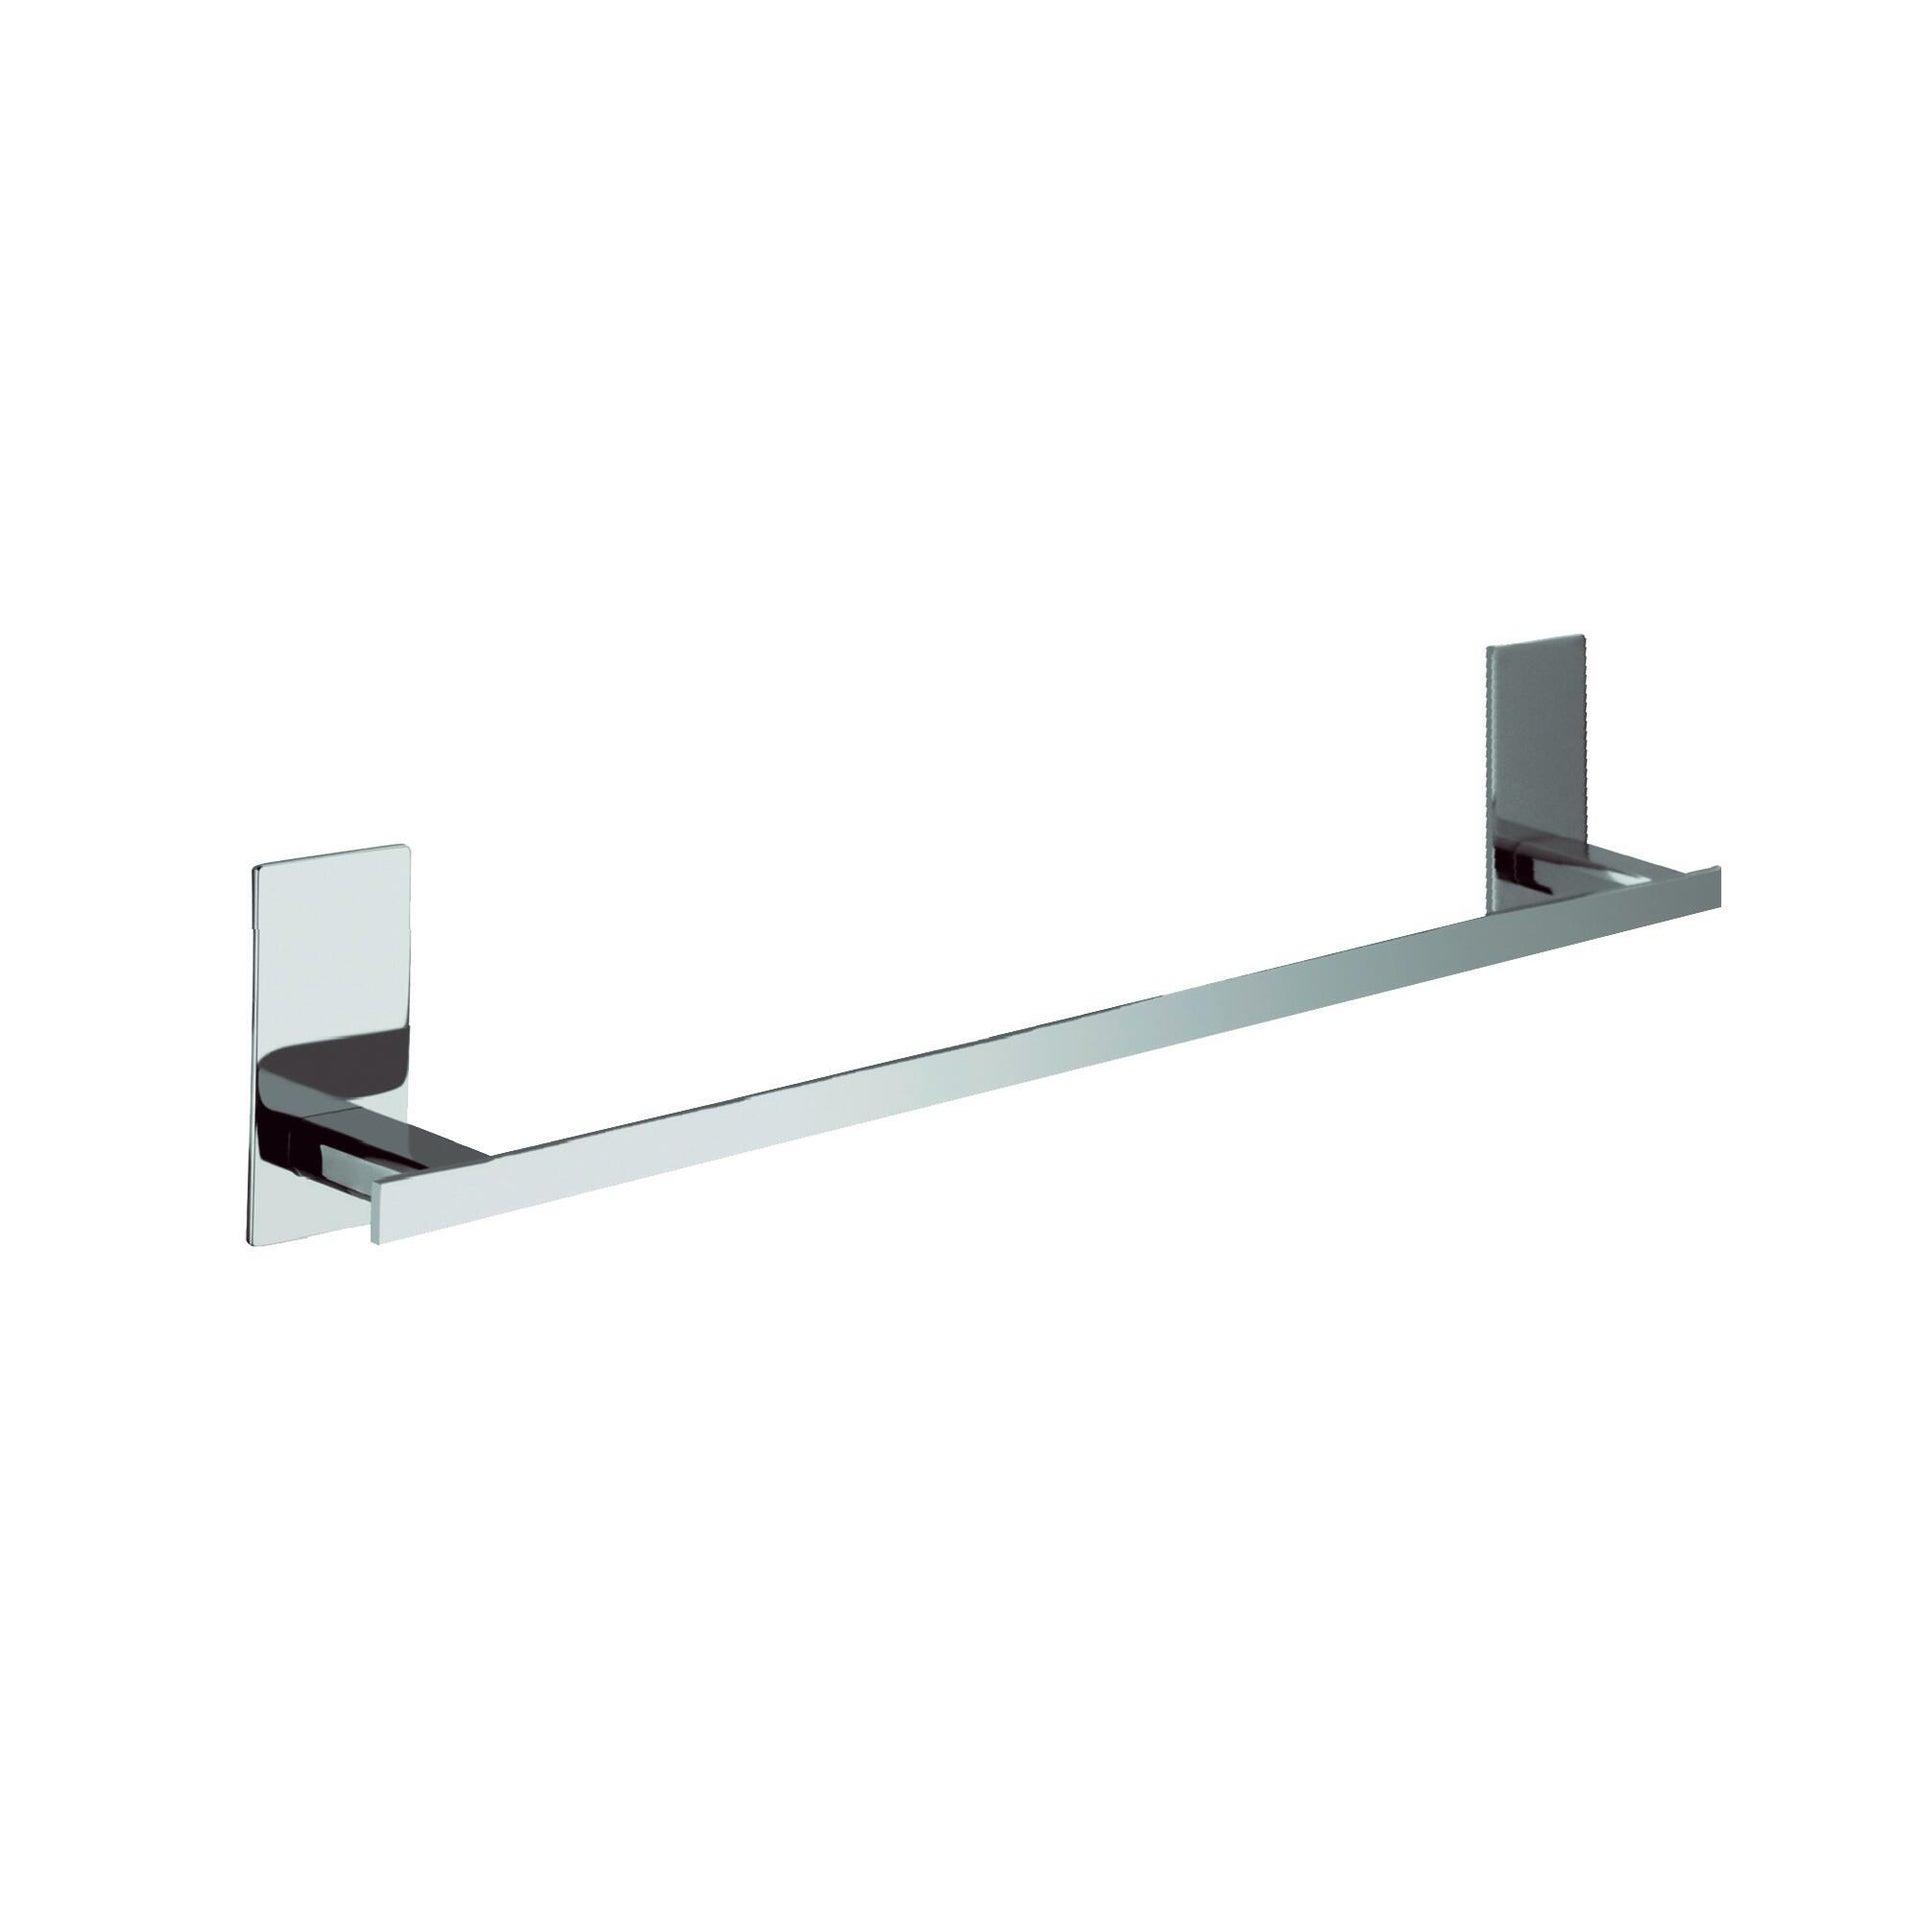 Porta salviette fisso a muro 1 barra Flat cromo lucido L 30 cm